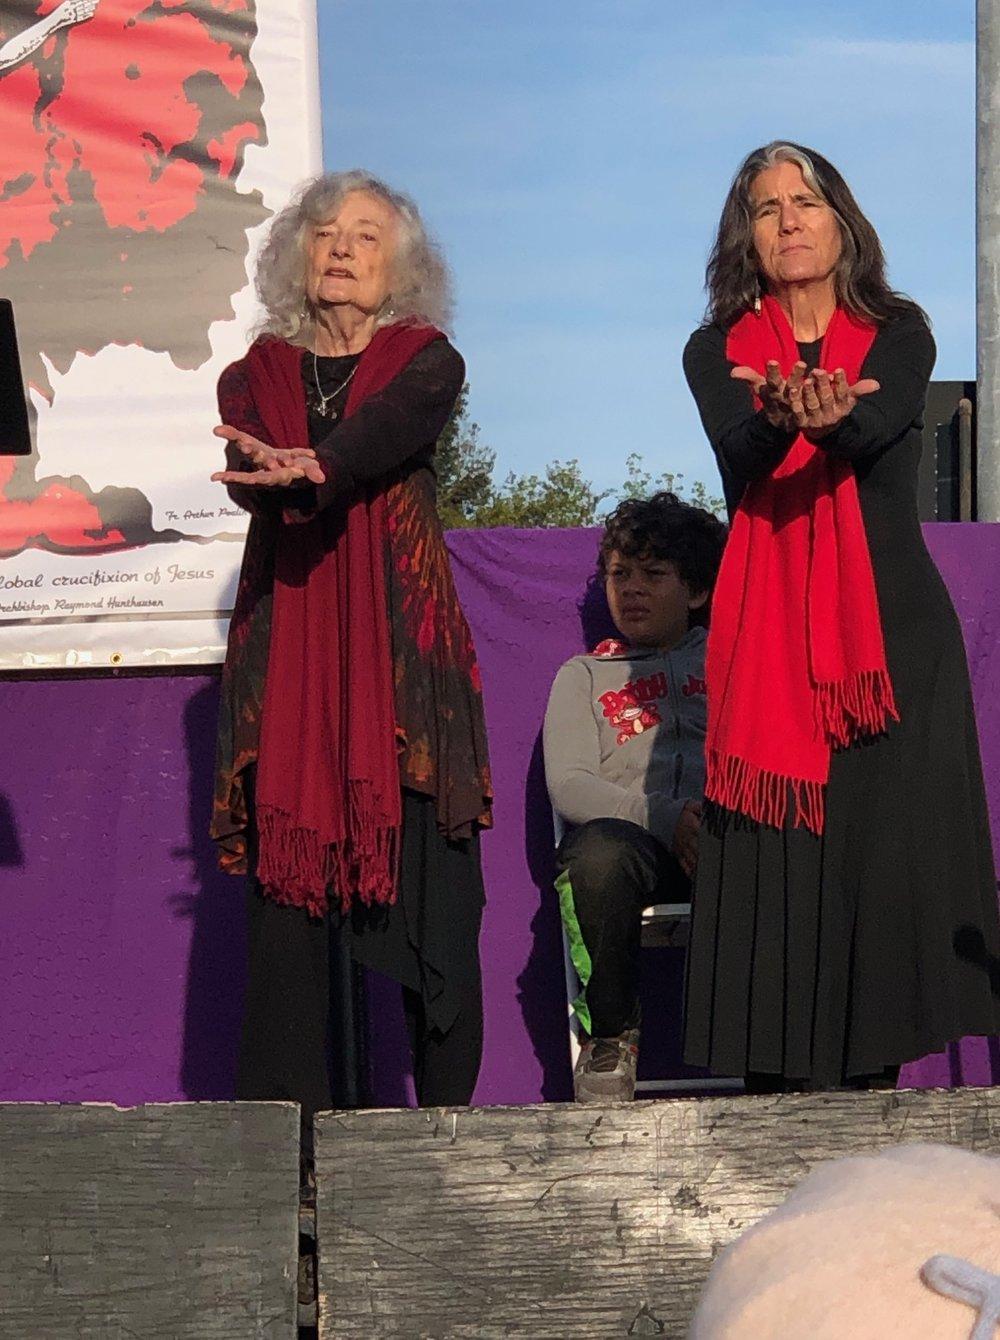 Sacred movement led by Carla De Sola & Kathleen Robbiano